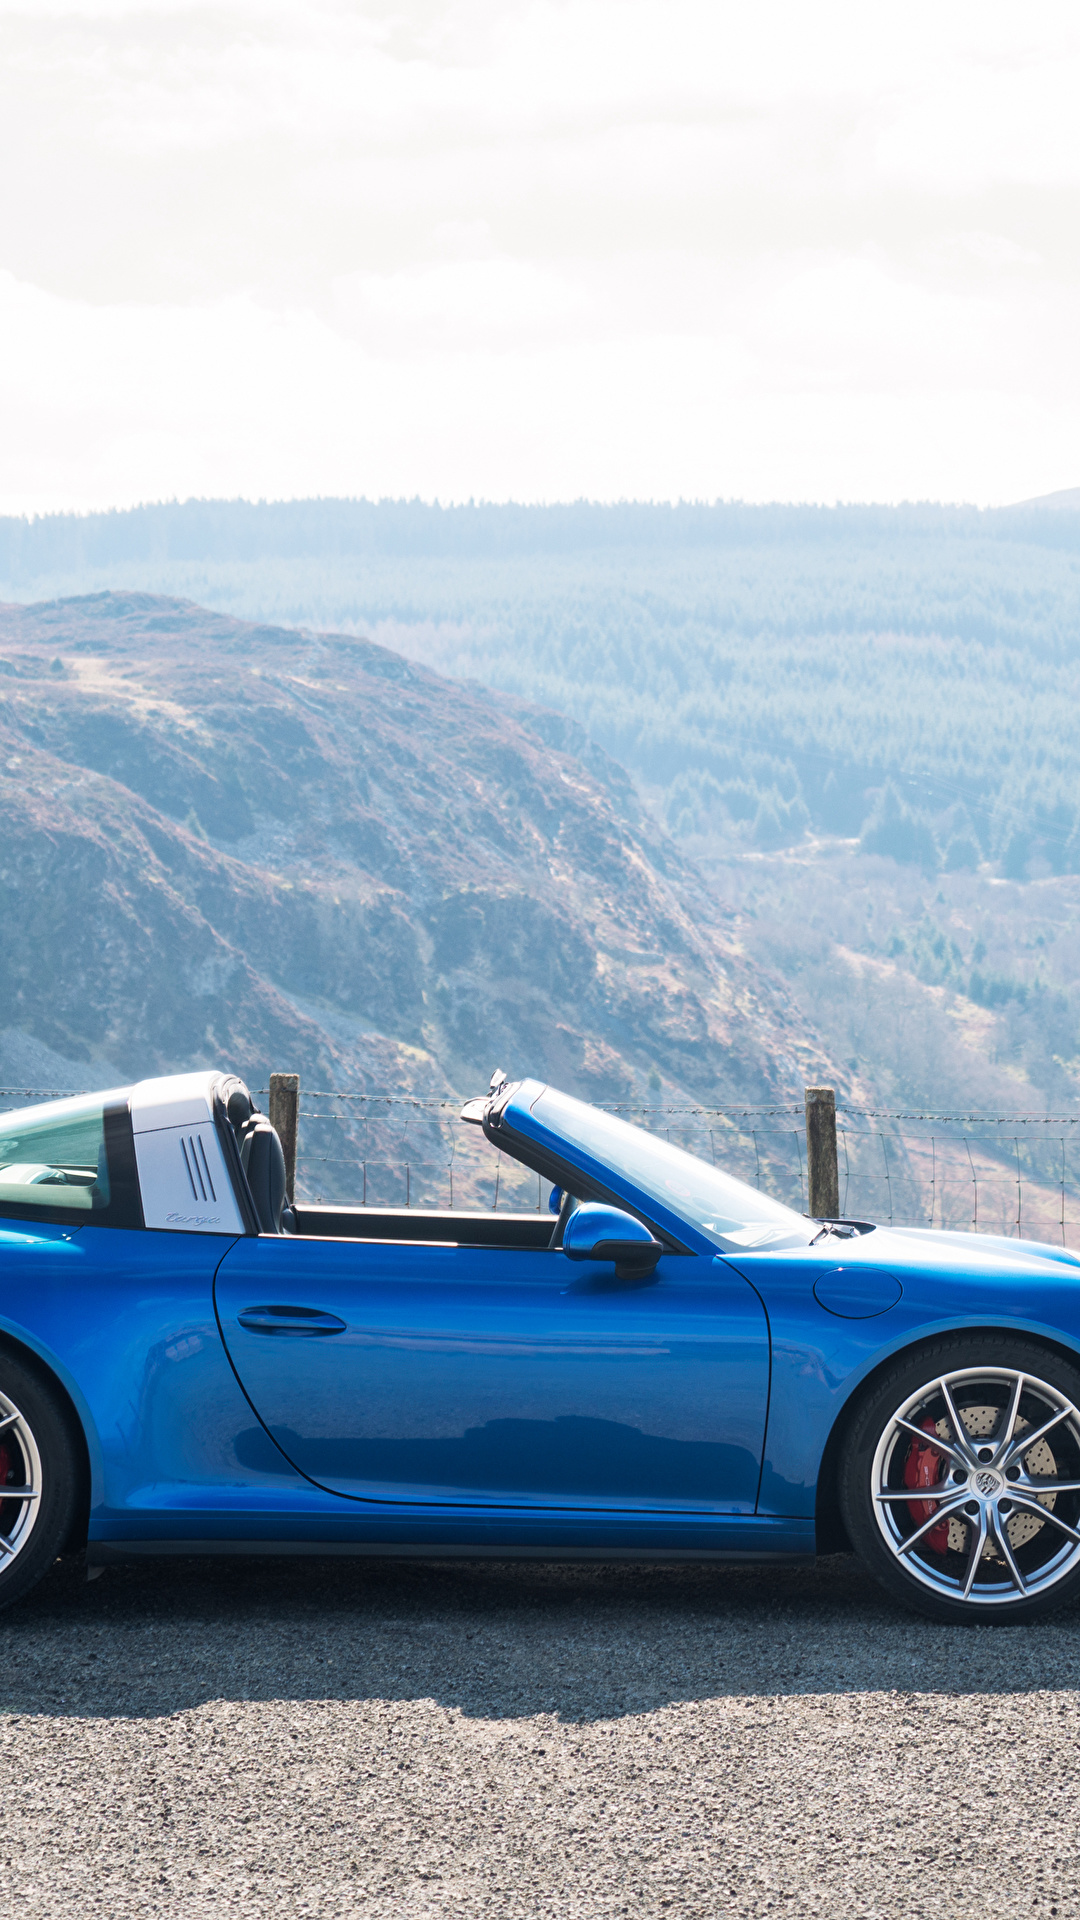 save off 54d03 aa7ad Photos Porsche 2016 911 Targa 4S Cabriolet Light Blue Side ...